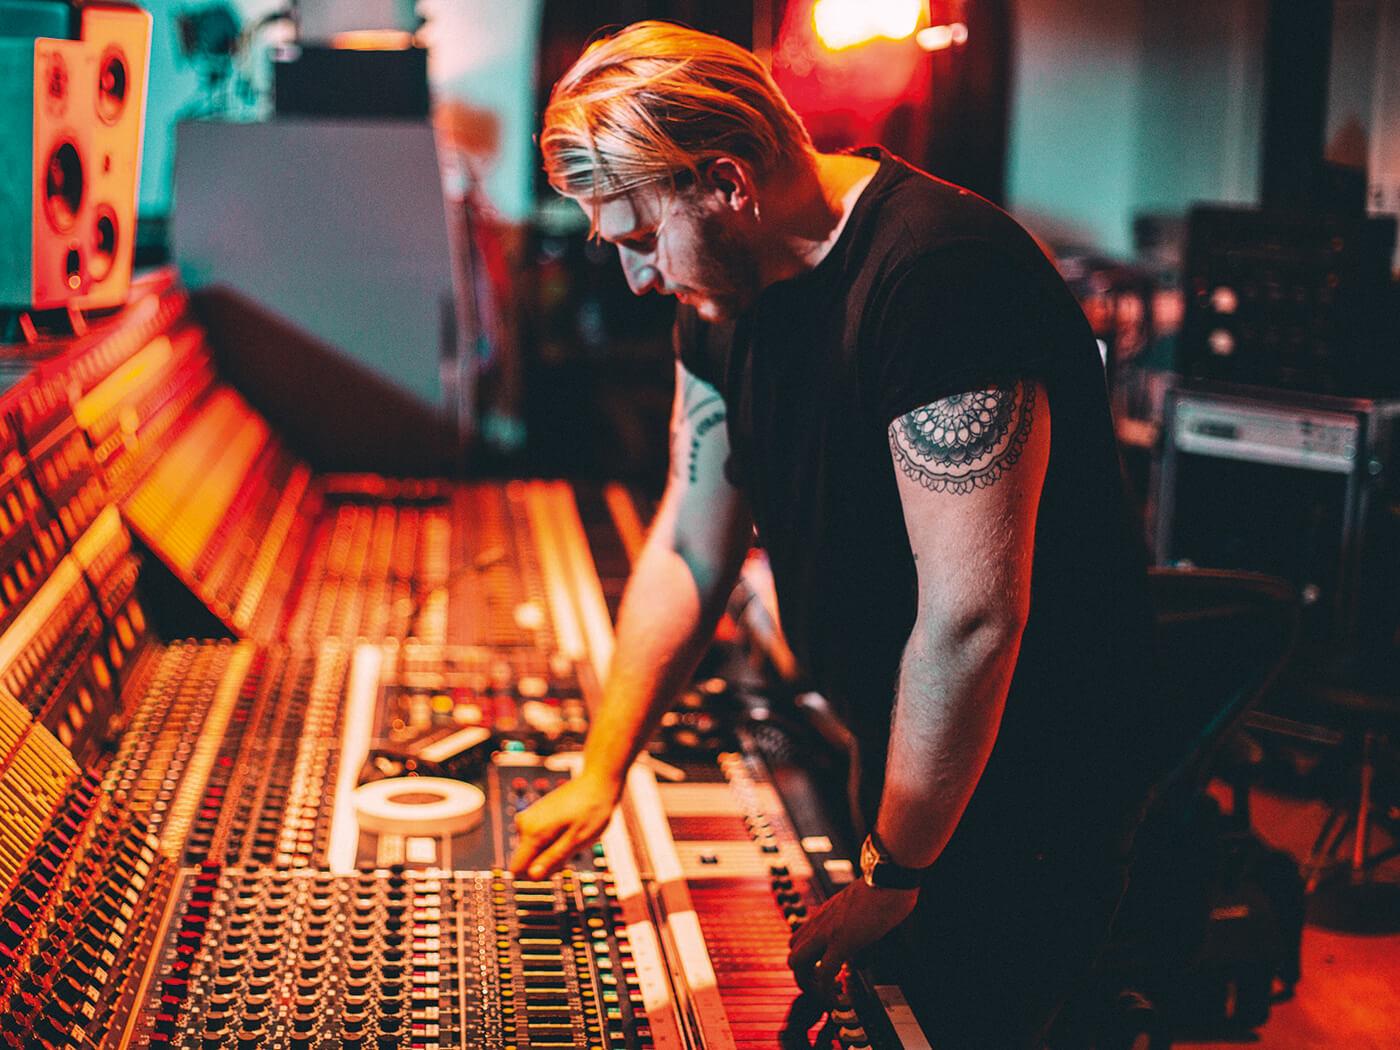 Interview: Alexander Archer talks life behind the desk